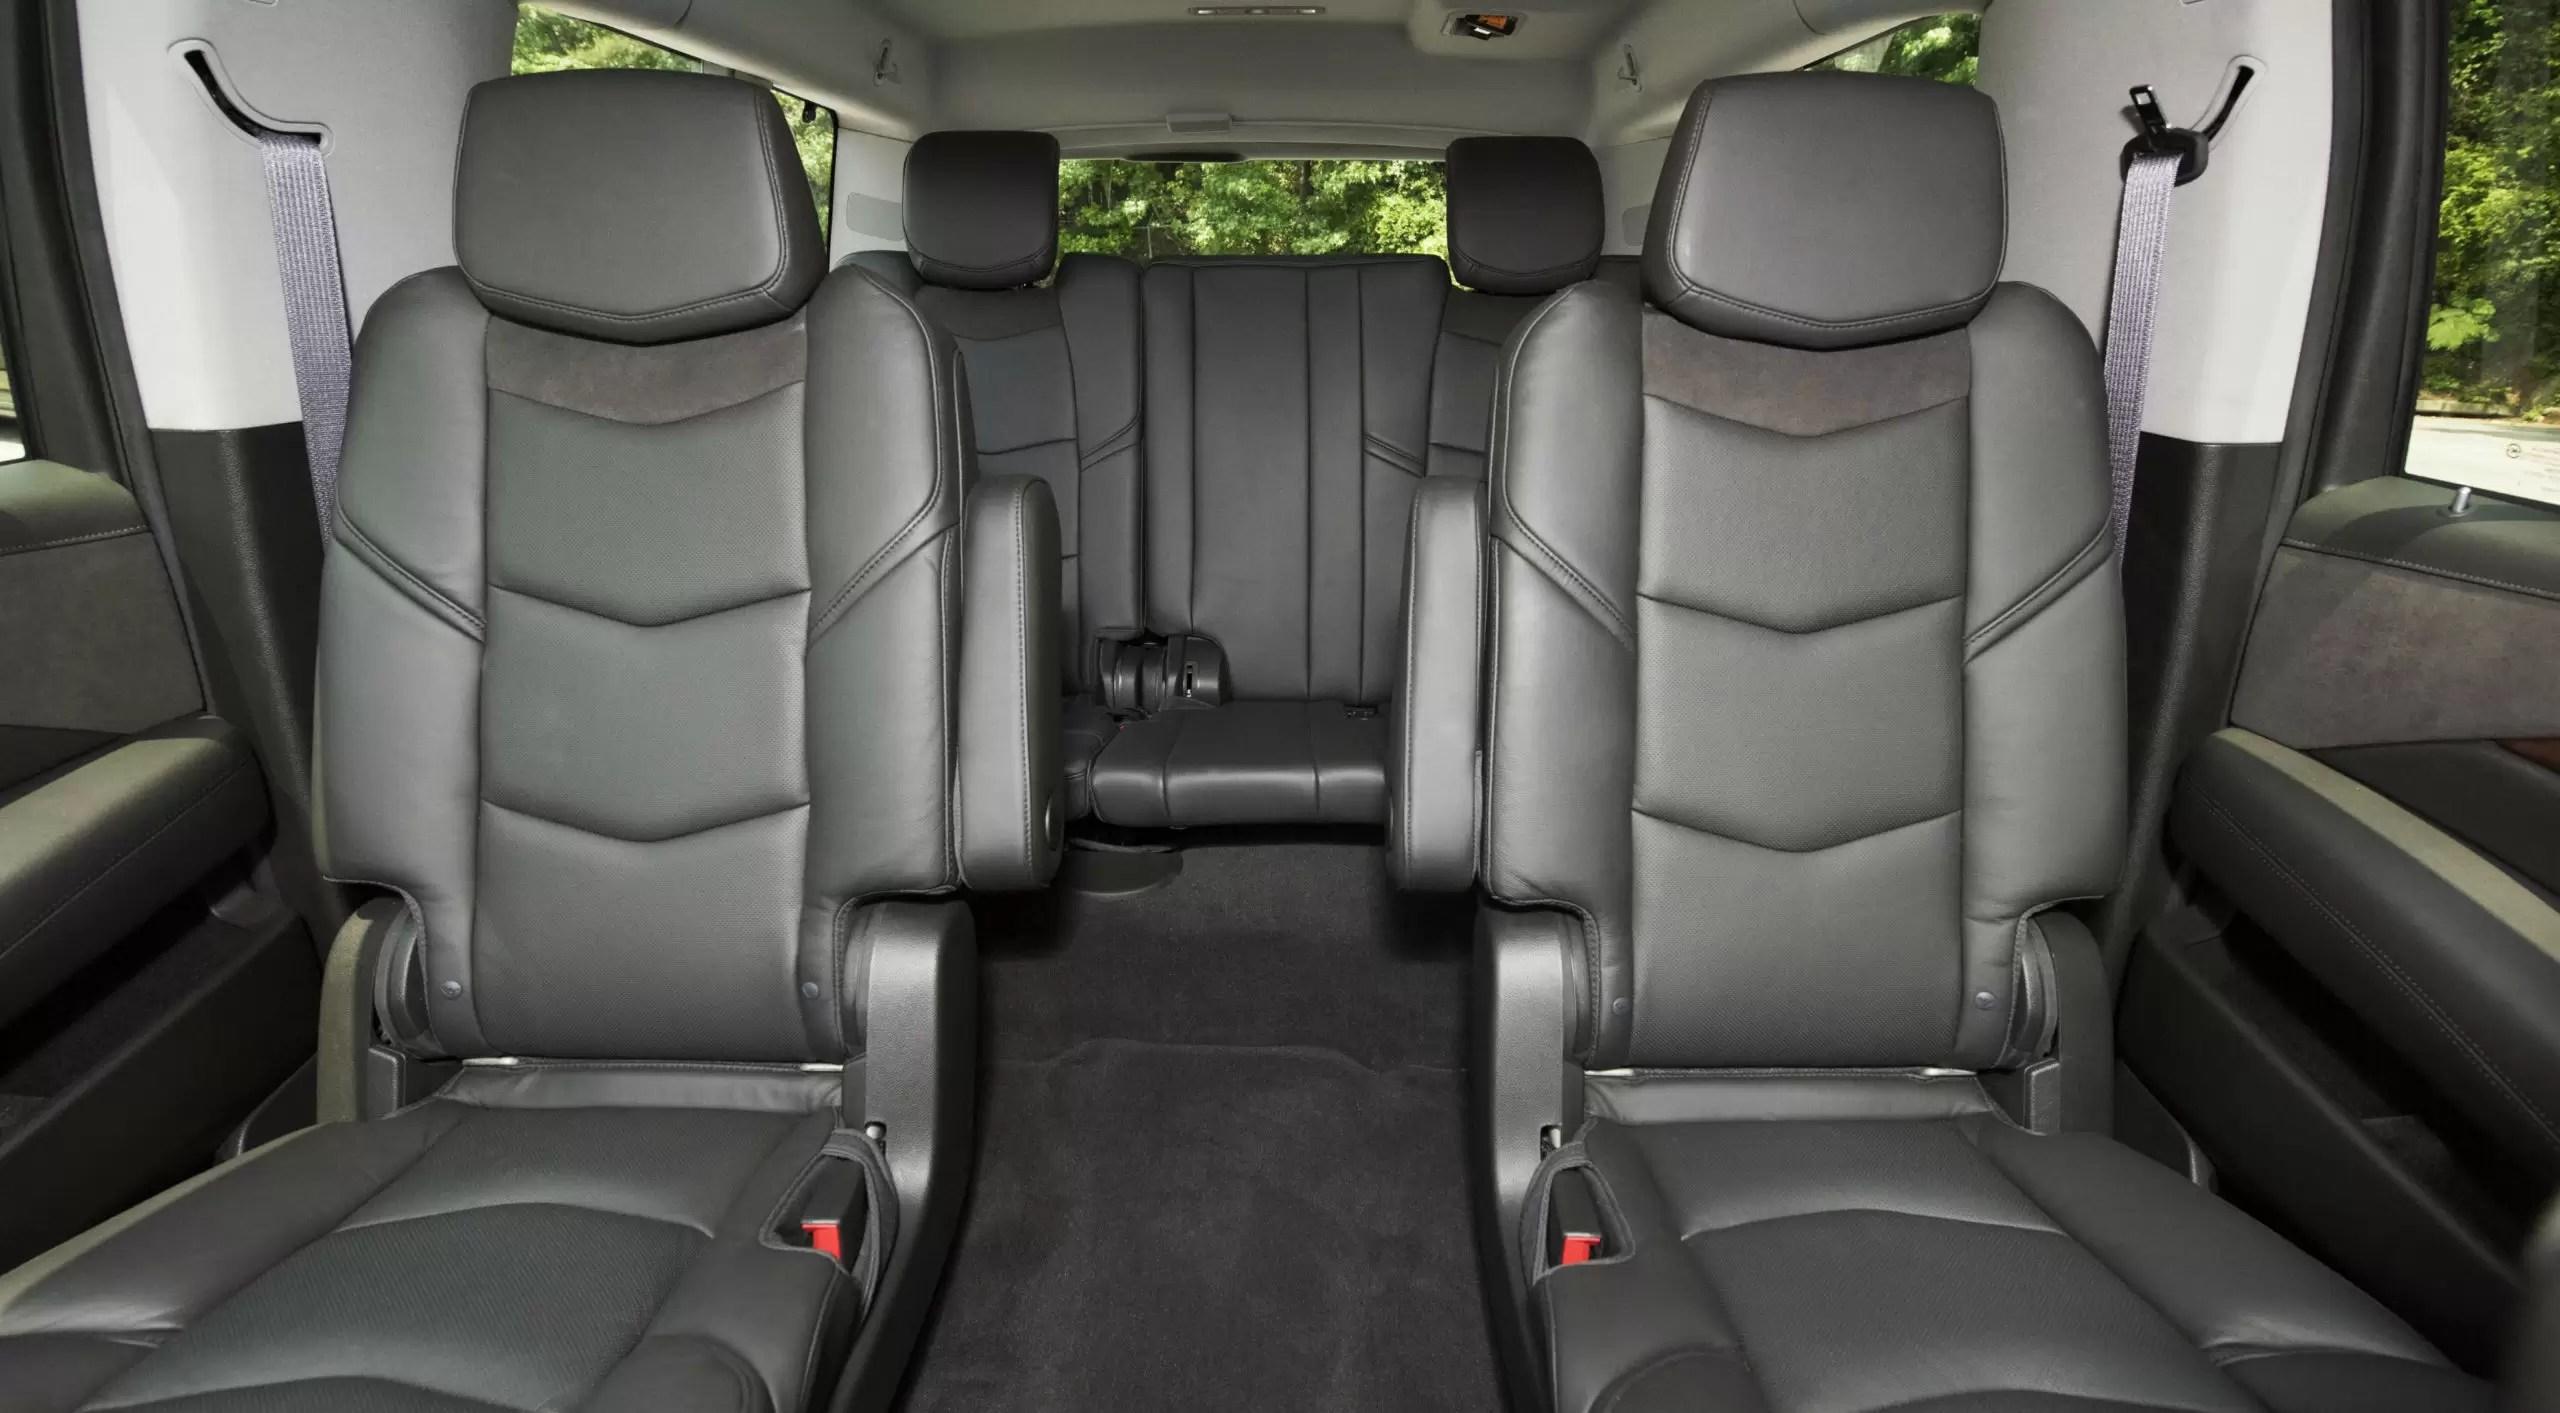 SUV Rentals in Atlanta Atlantic Limousine & Transportation